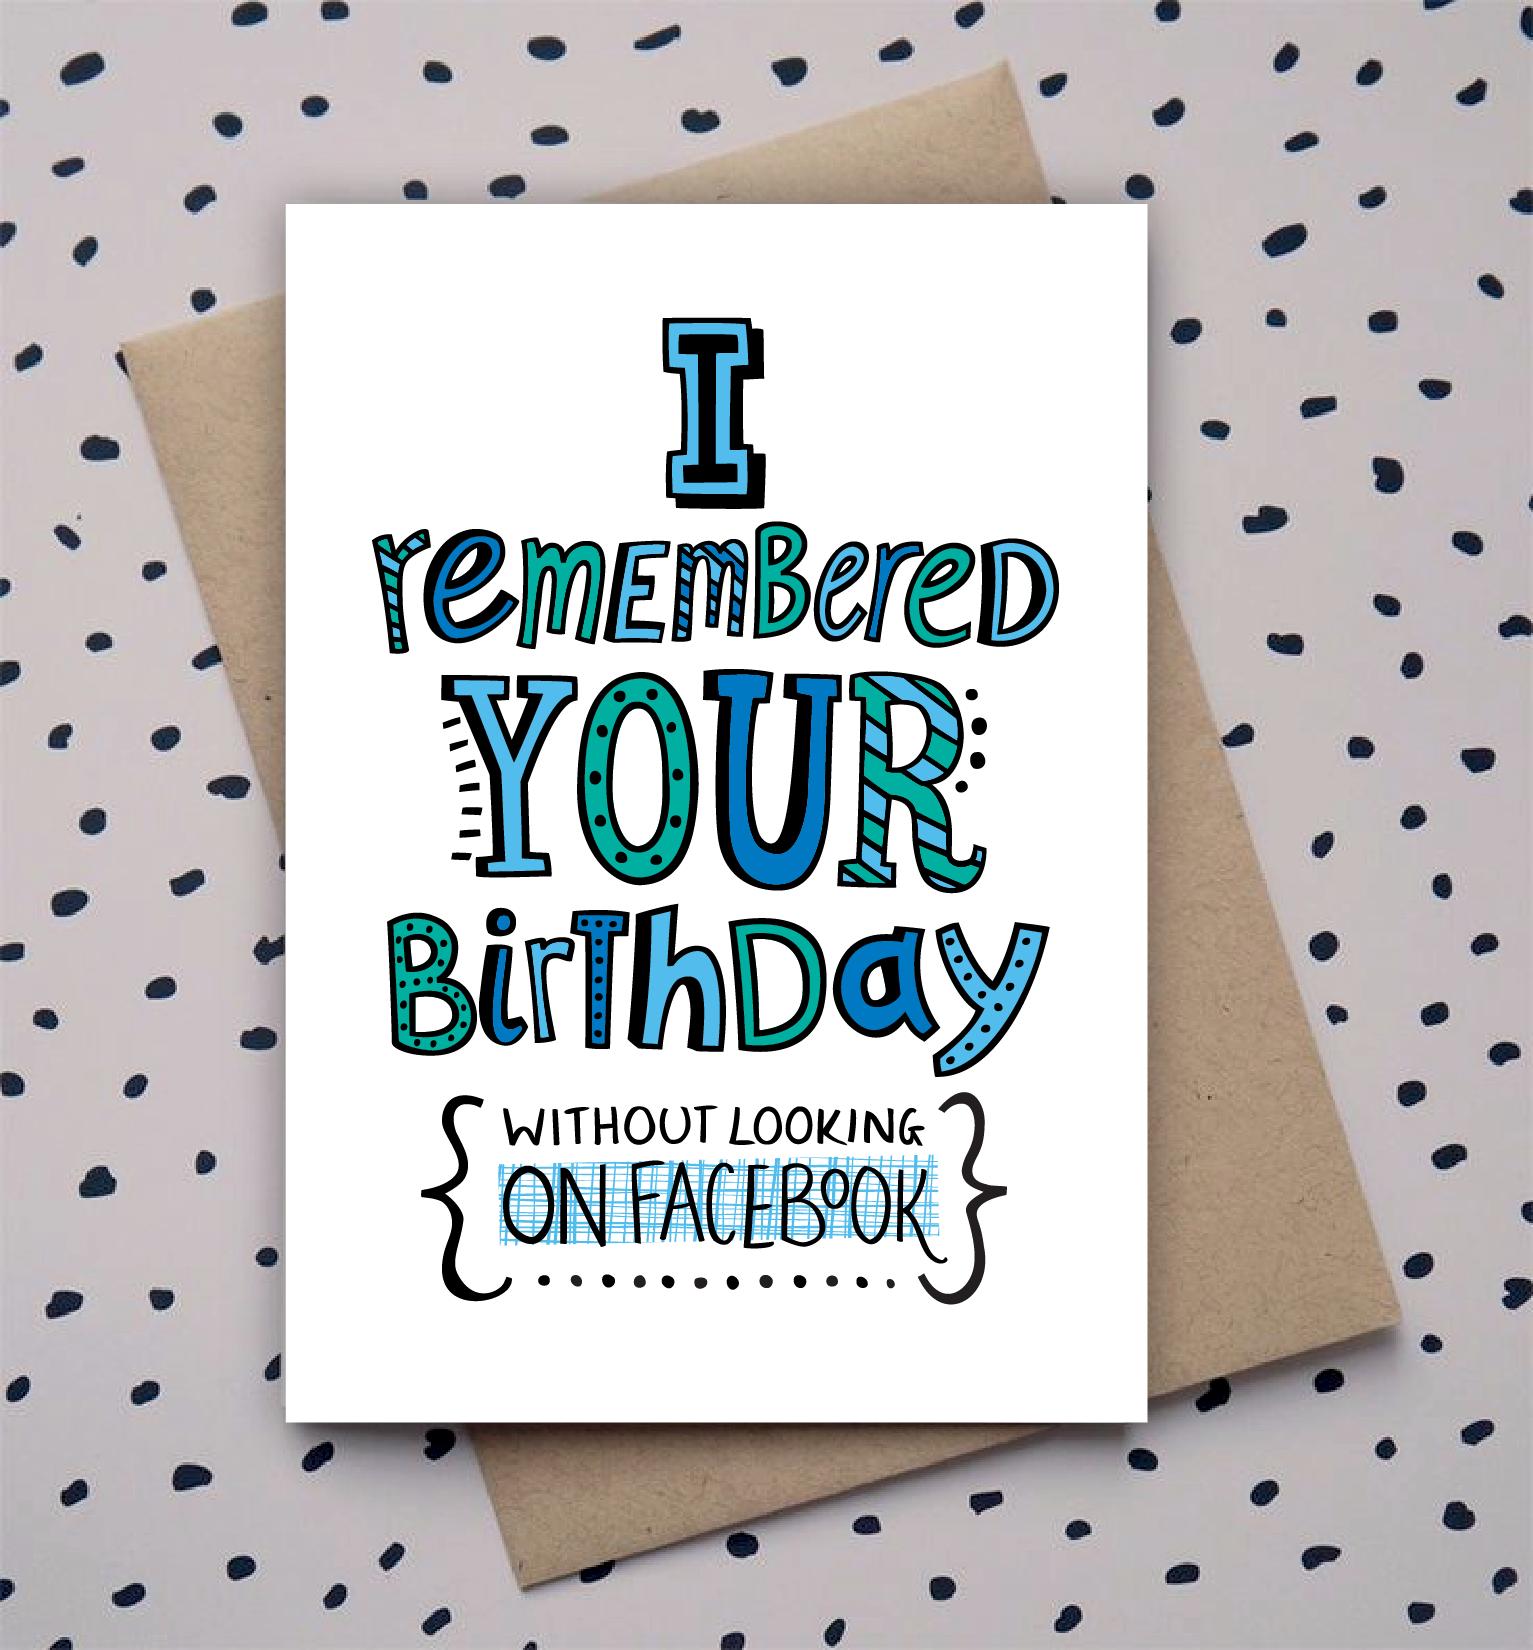 Birthday Cards Drawing At GetDrawings.com